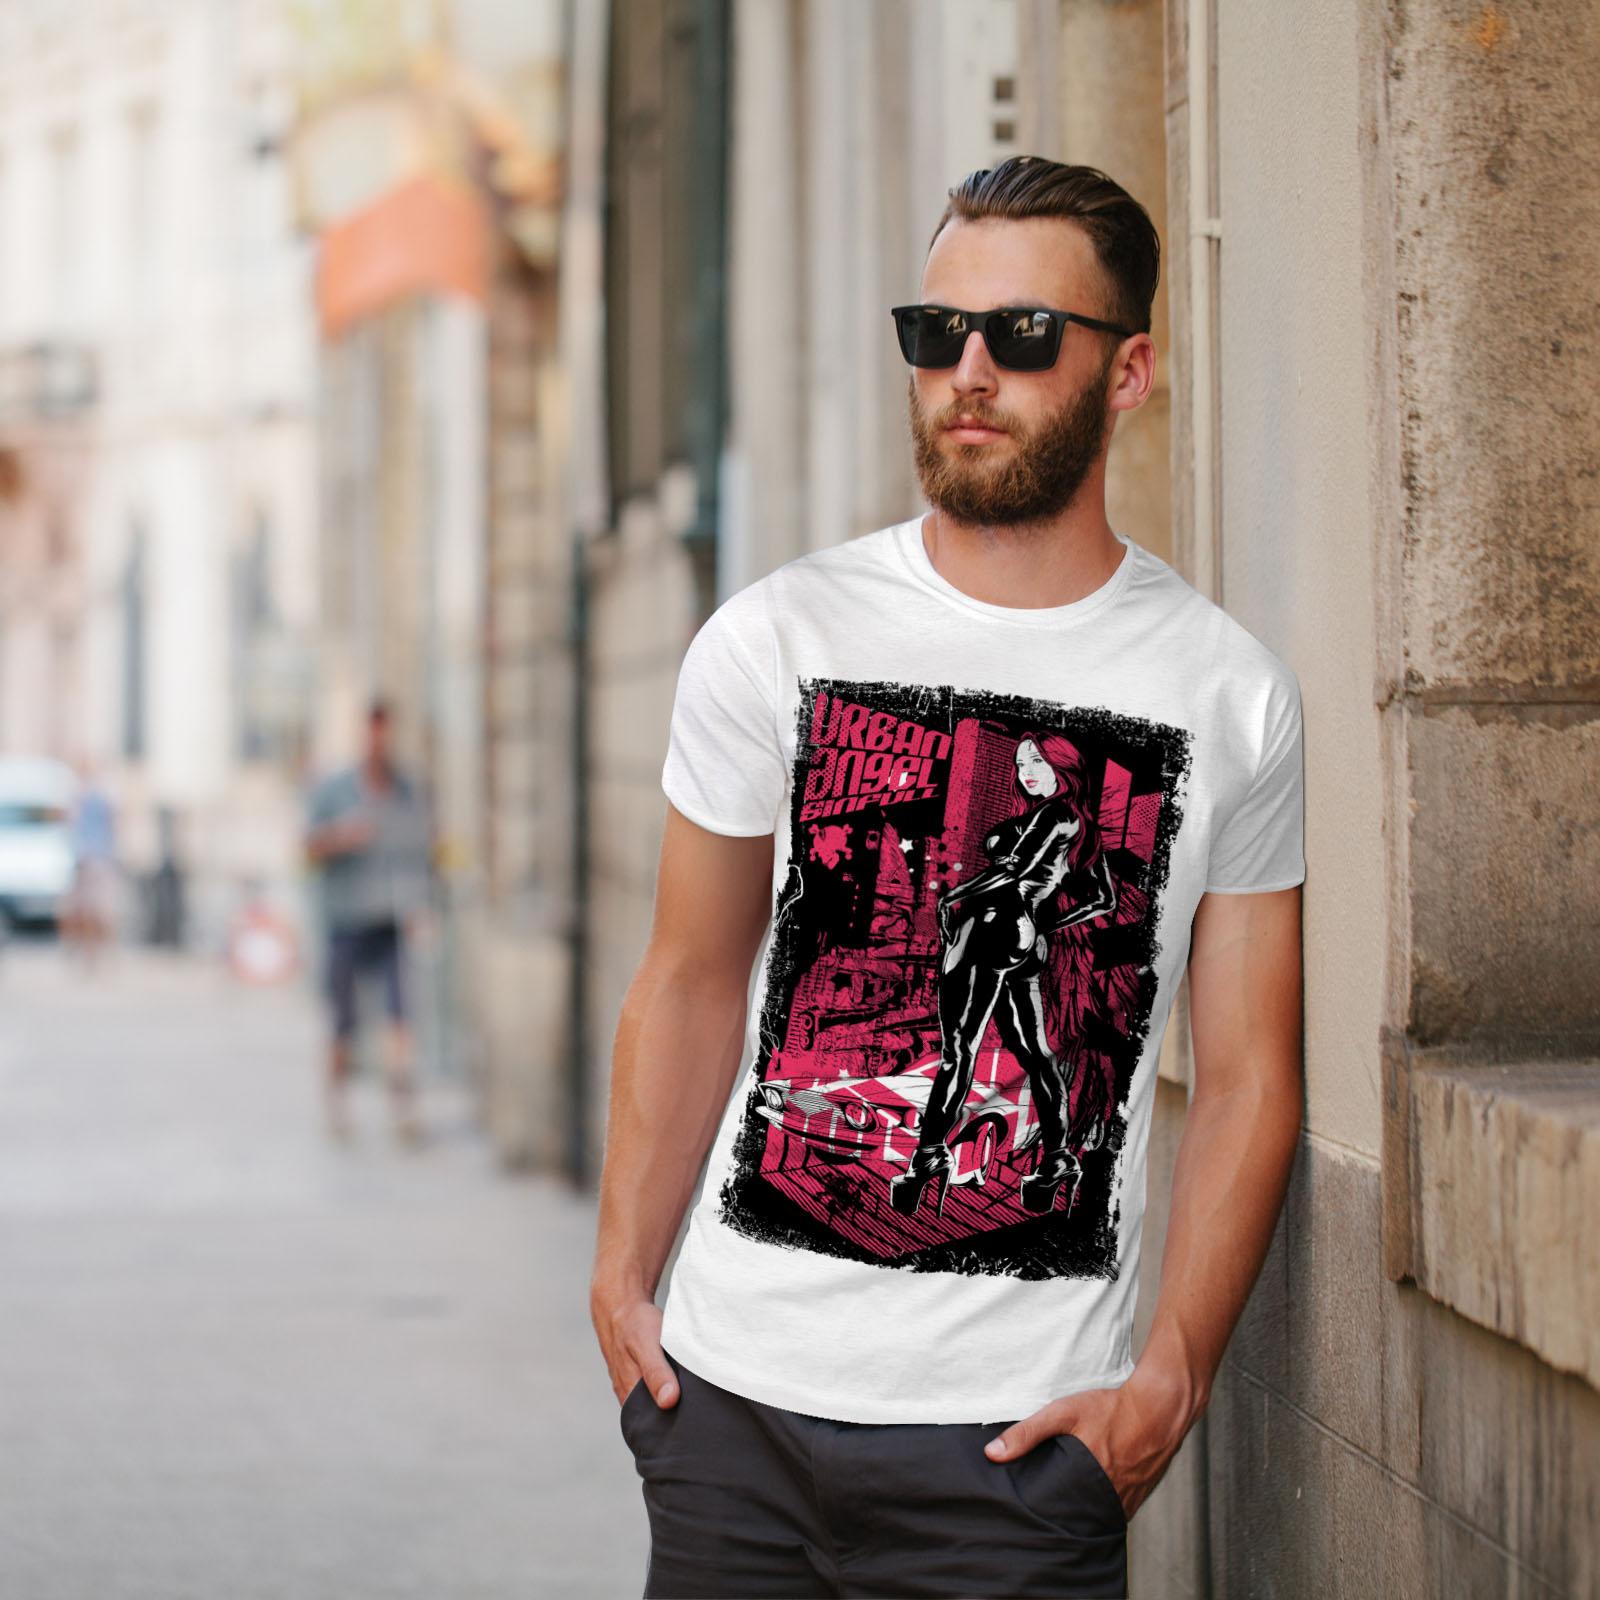 Car Casual Design Printed Tee Wellcoda Welcome To Jungle Animal Womens T-shirt